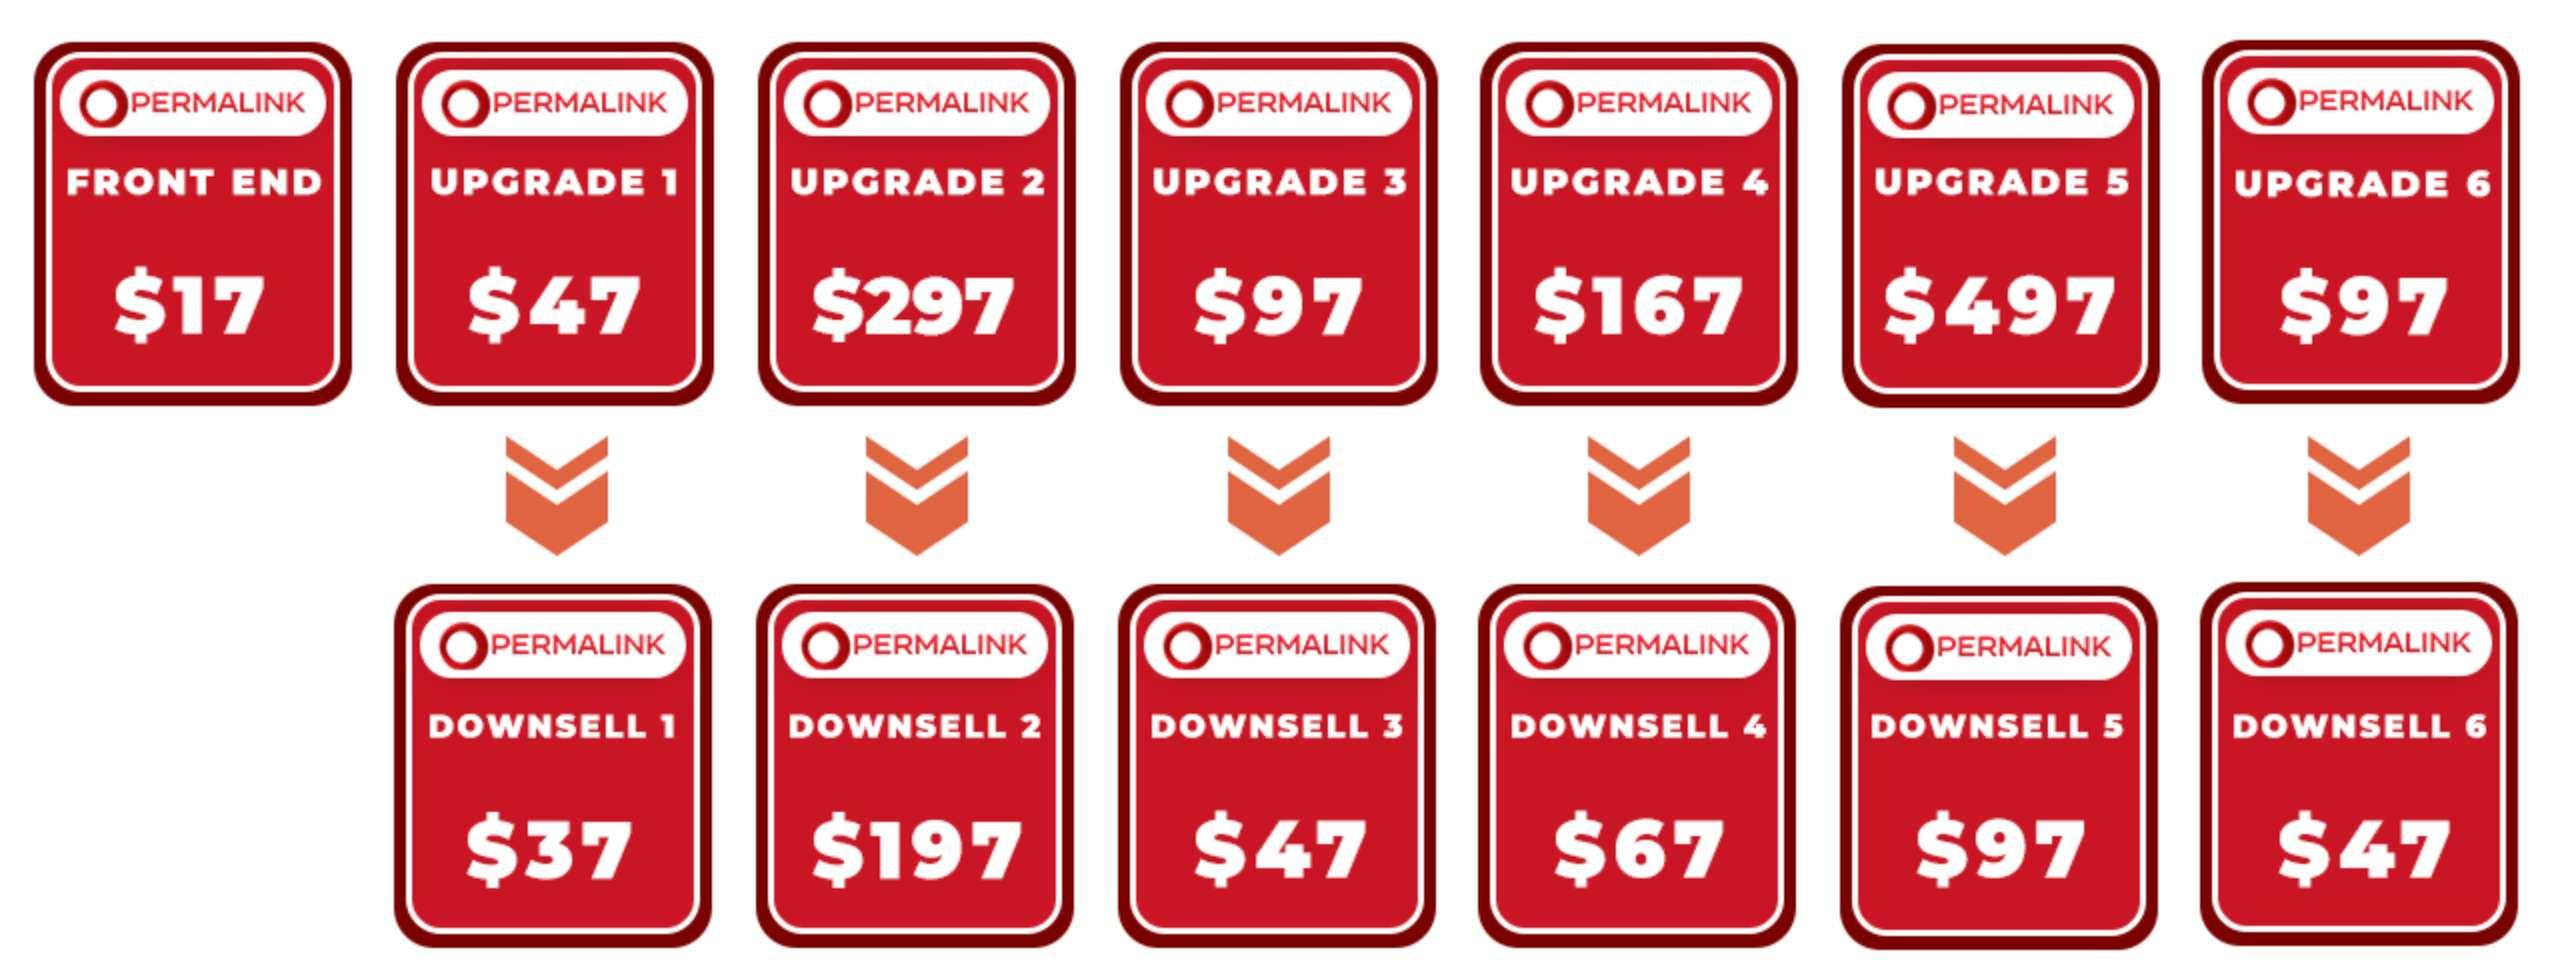 PermaLink Review: Pricing & Upsells